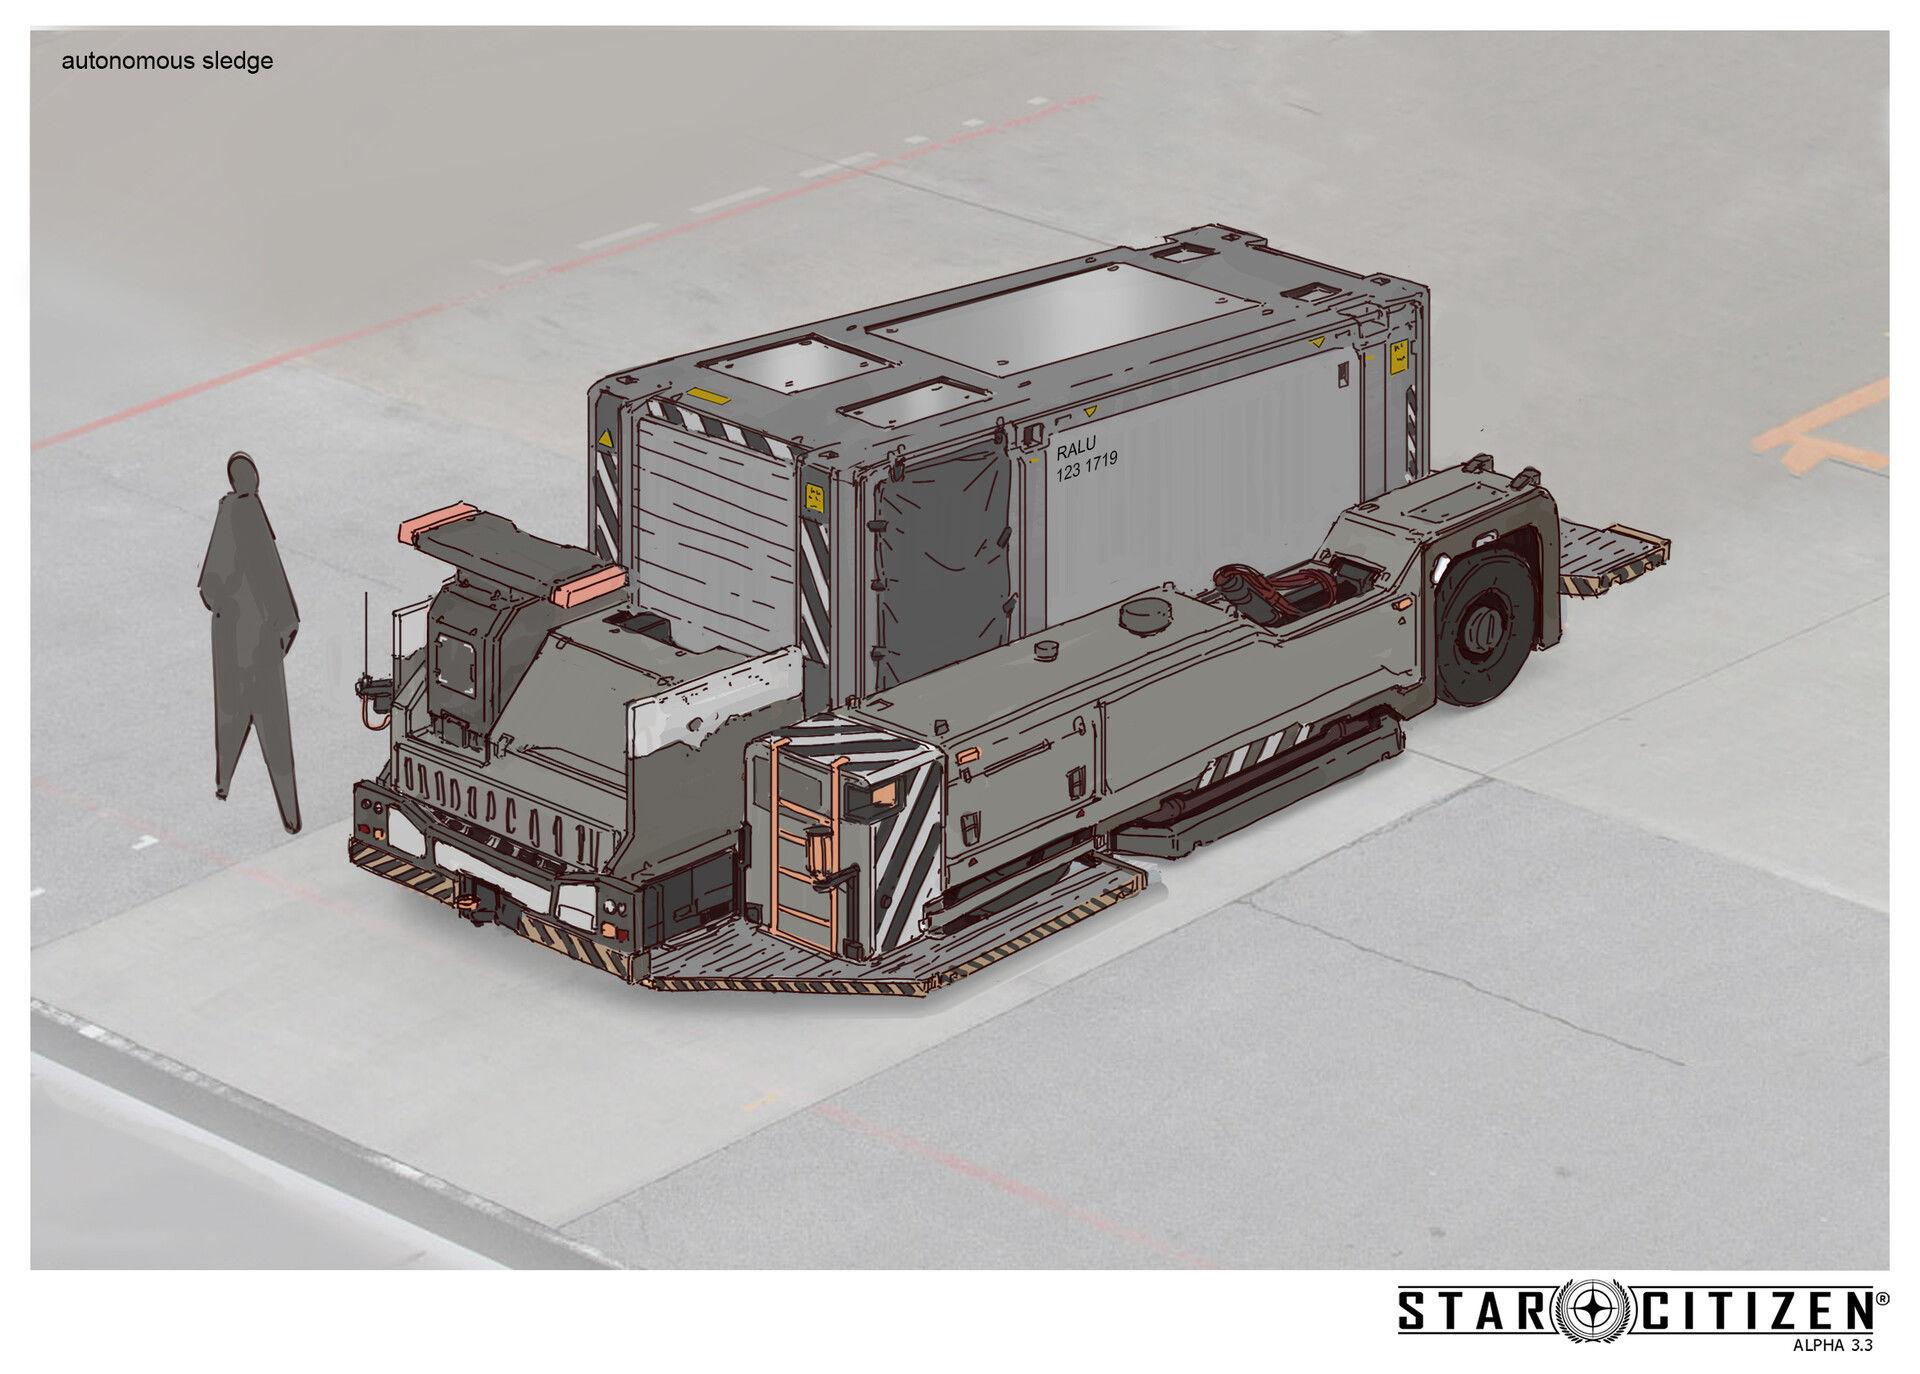 Transporter autonomiczny - koncept 01